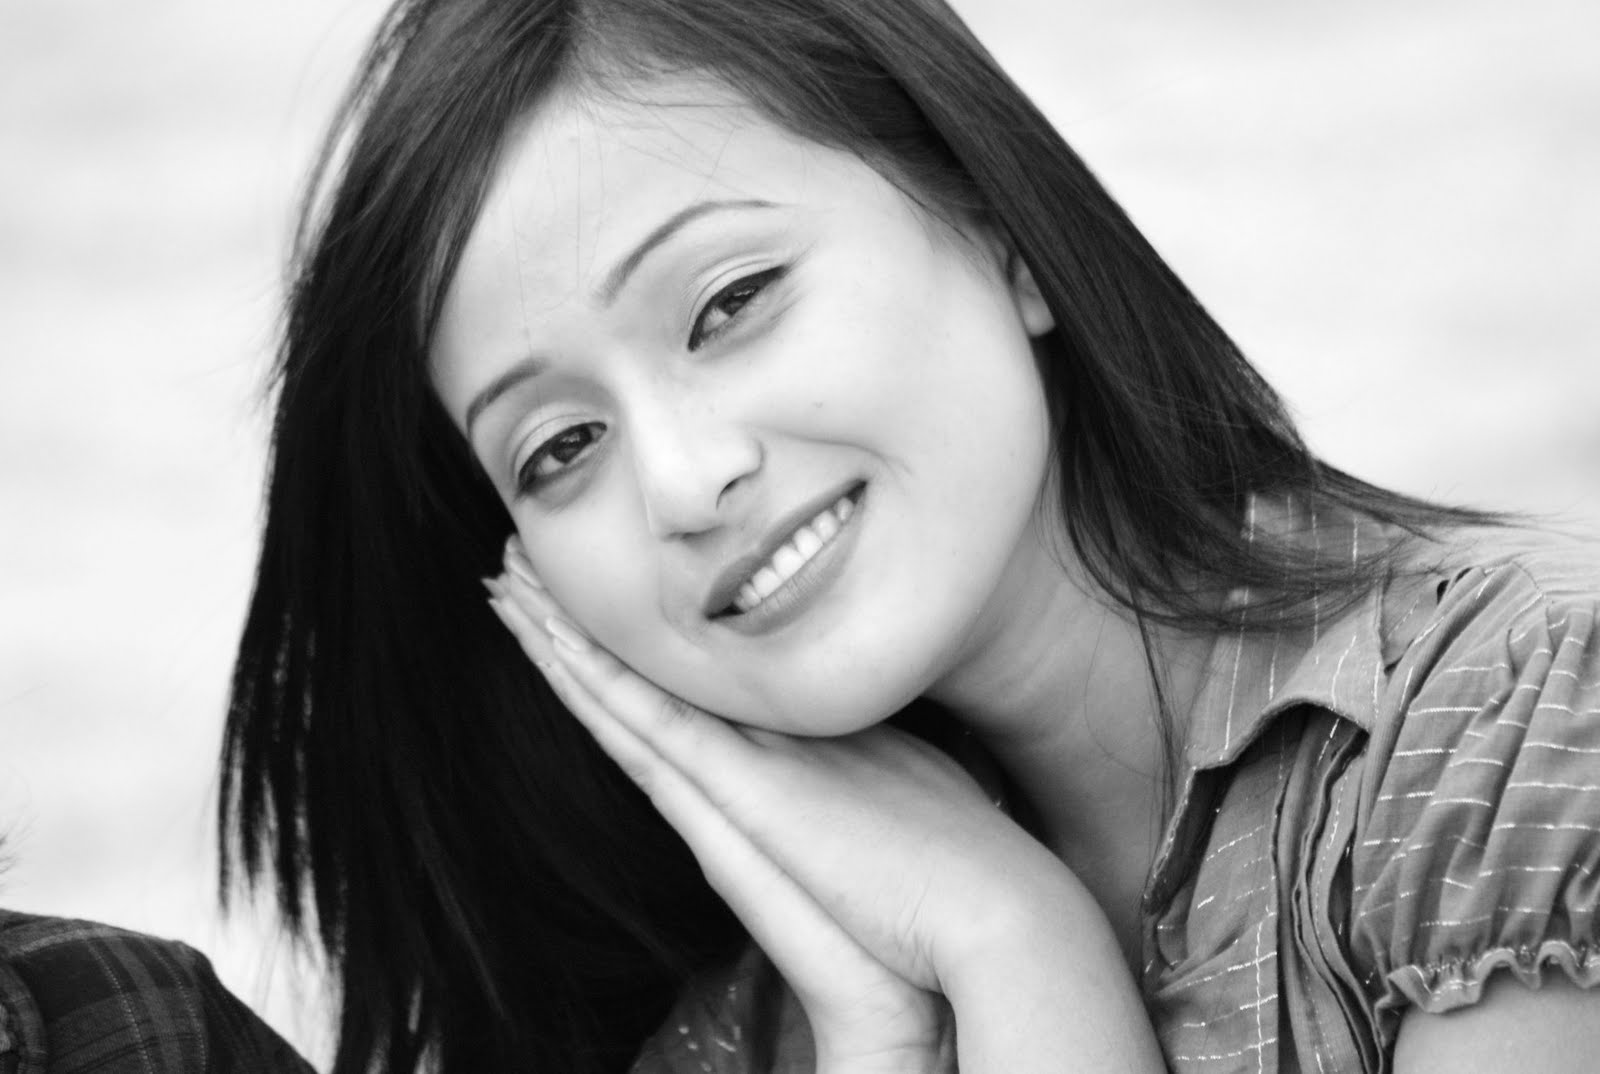 Bala hijam black and white wallpapers